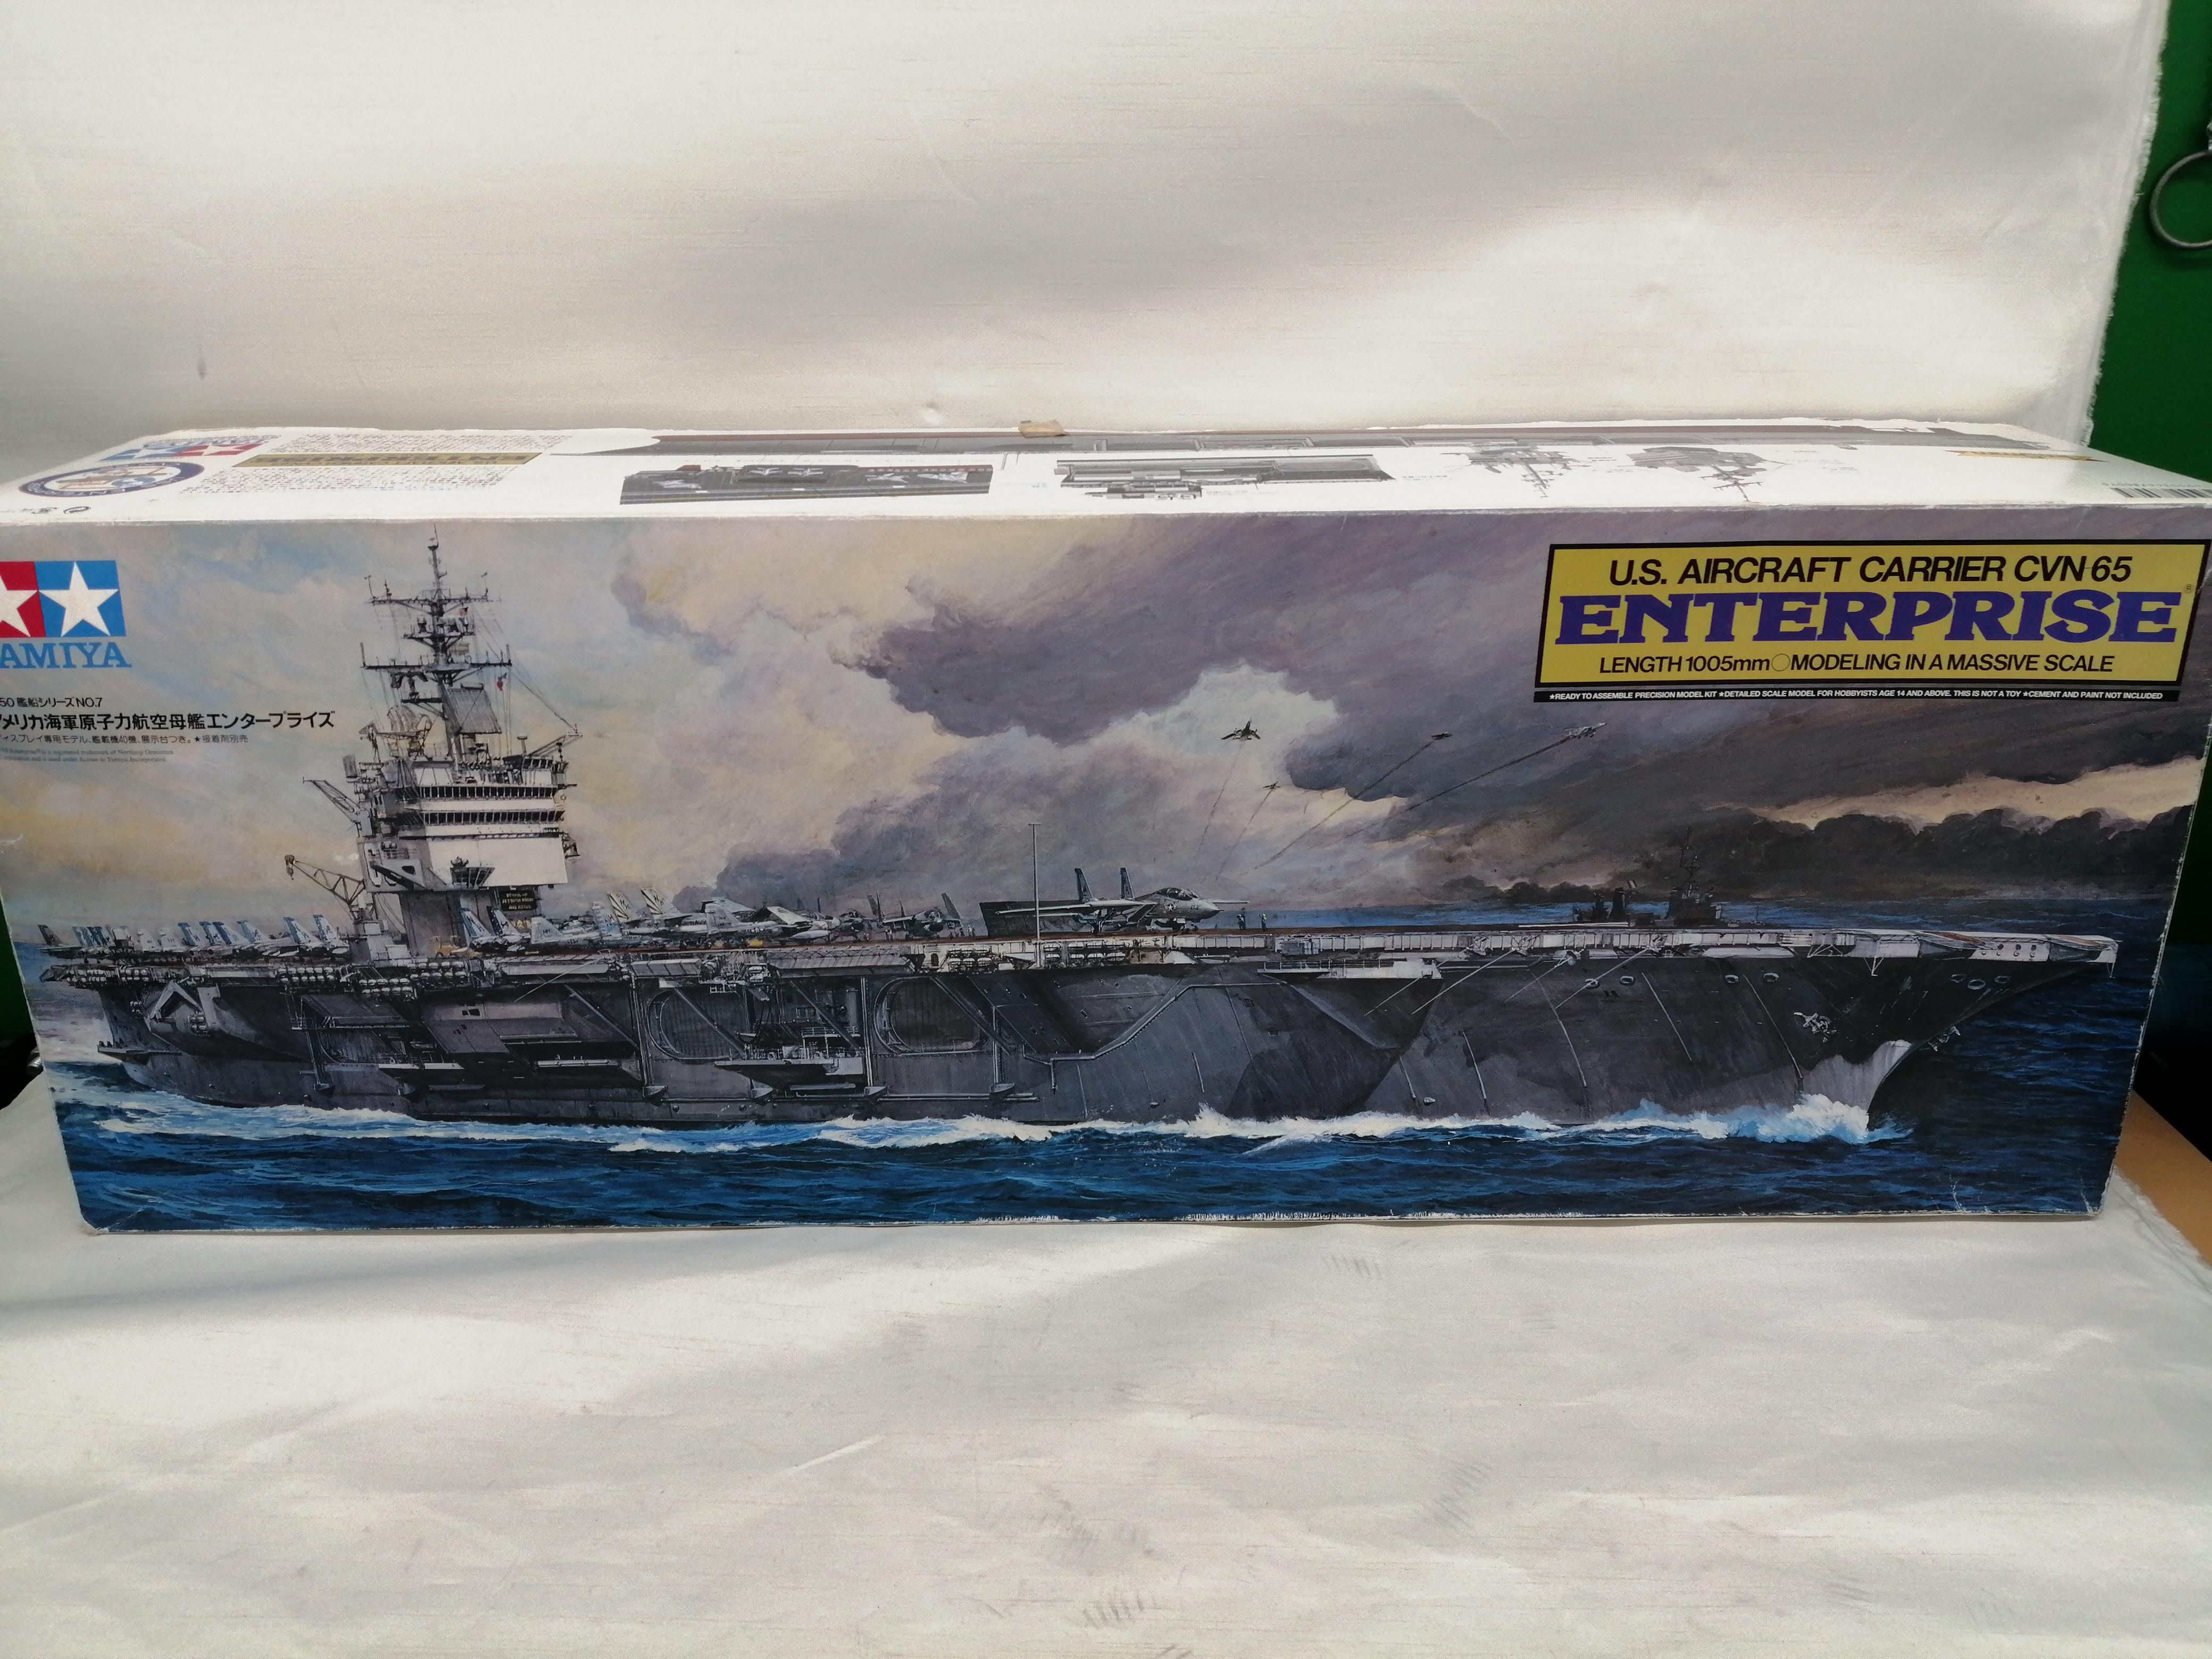 アメリカ海軍原子力航空母艦|TAMIYA